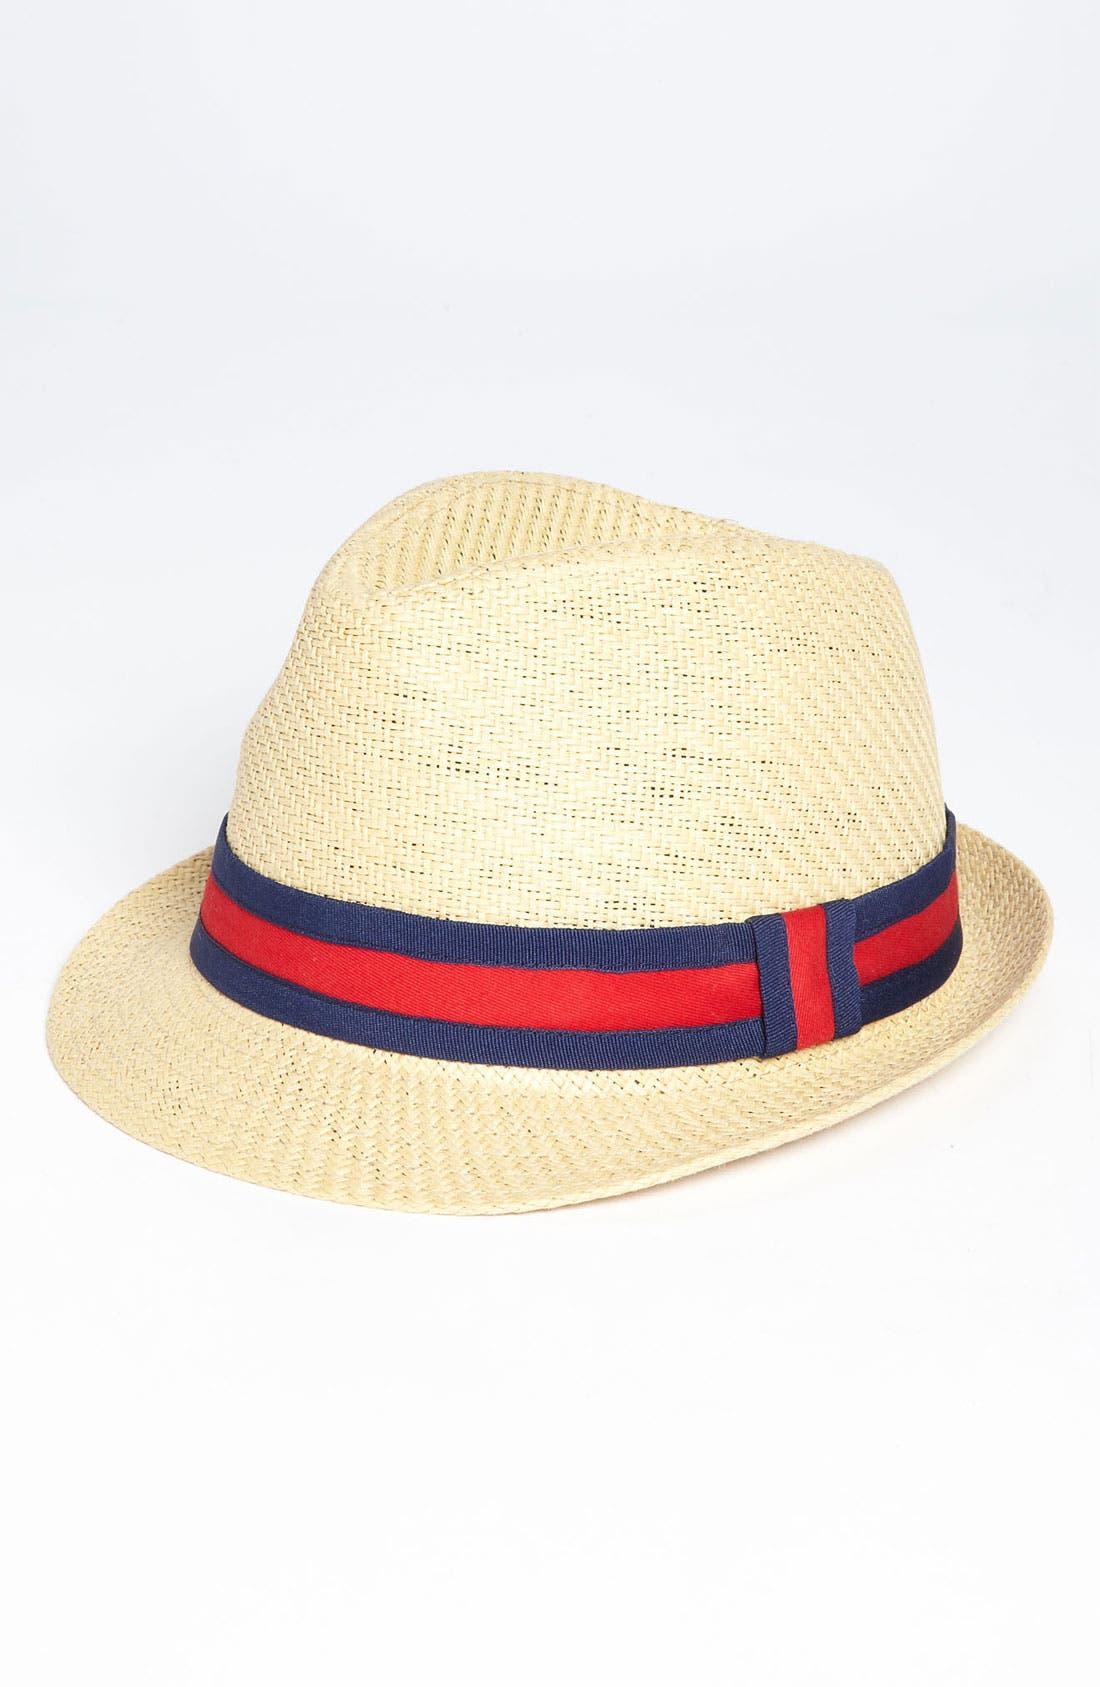 Main Image - Glory Hats by Goorin 'Jackson' Fedora